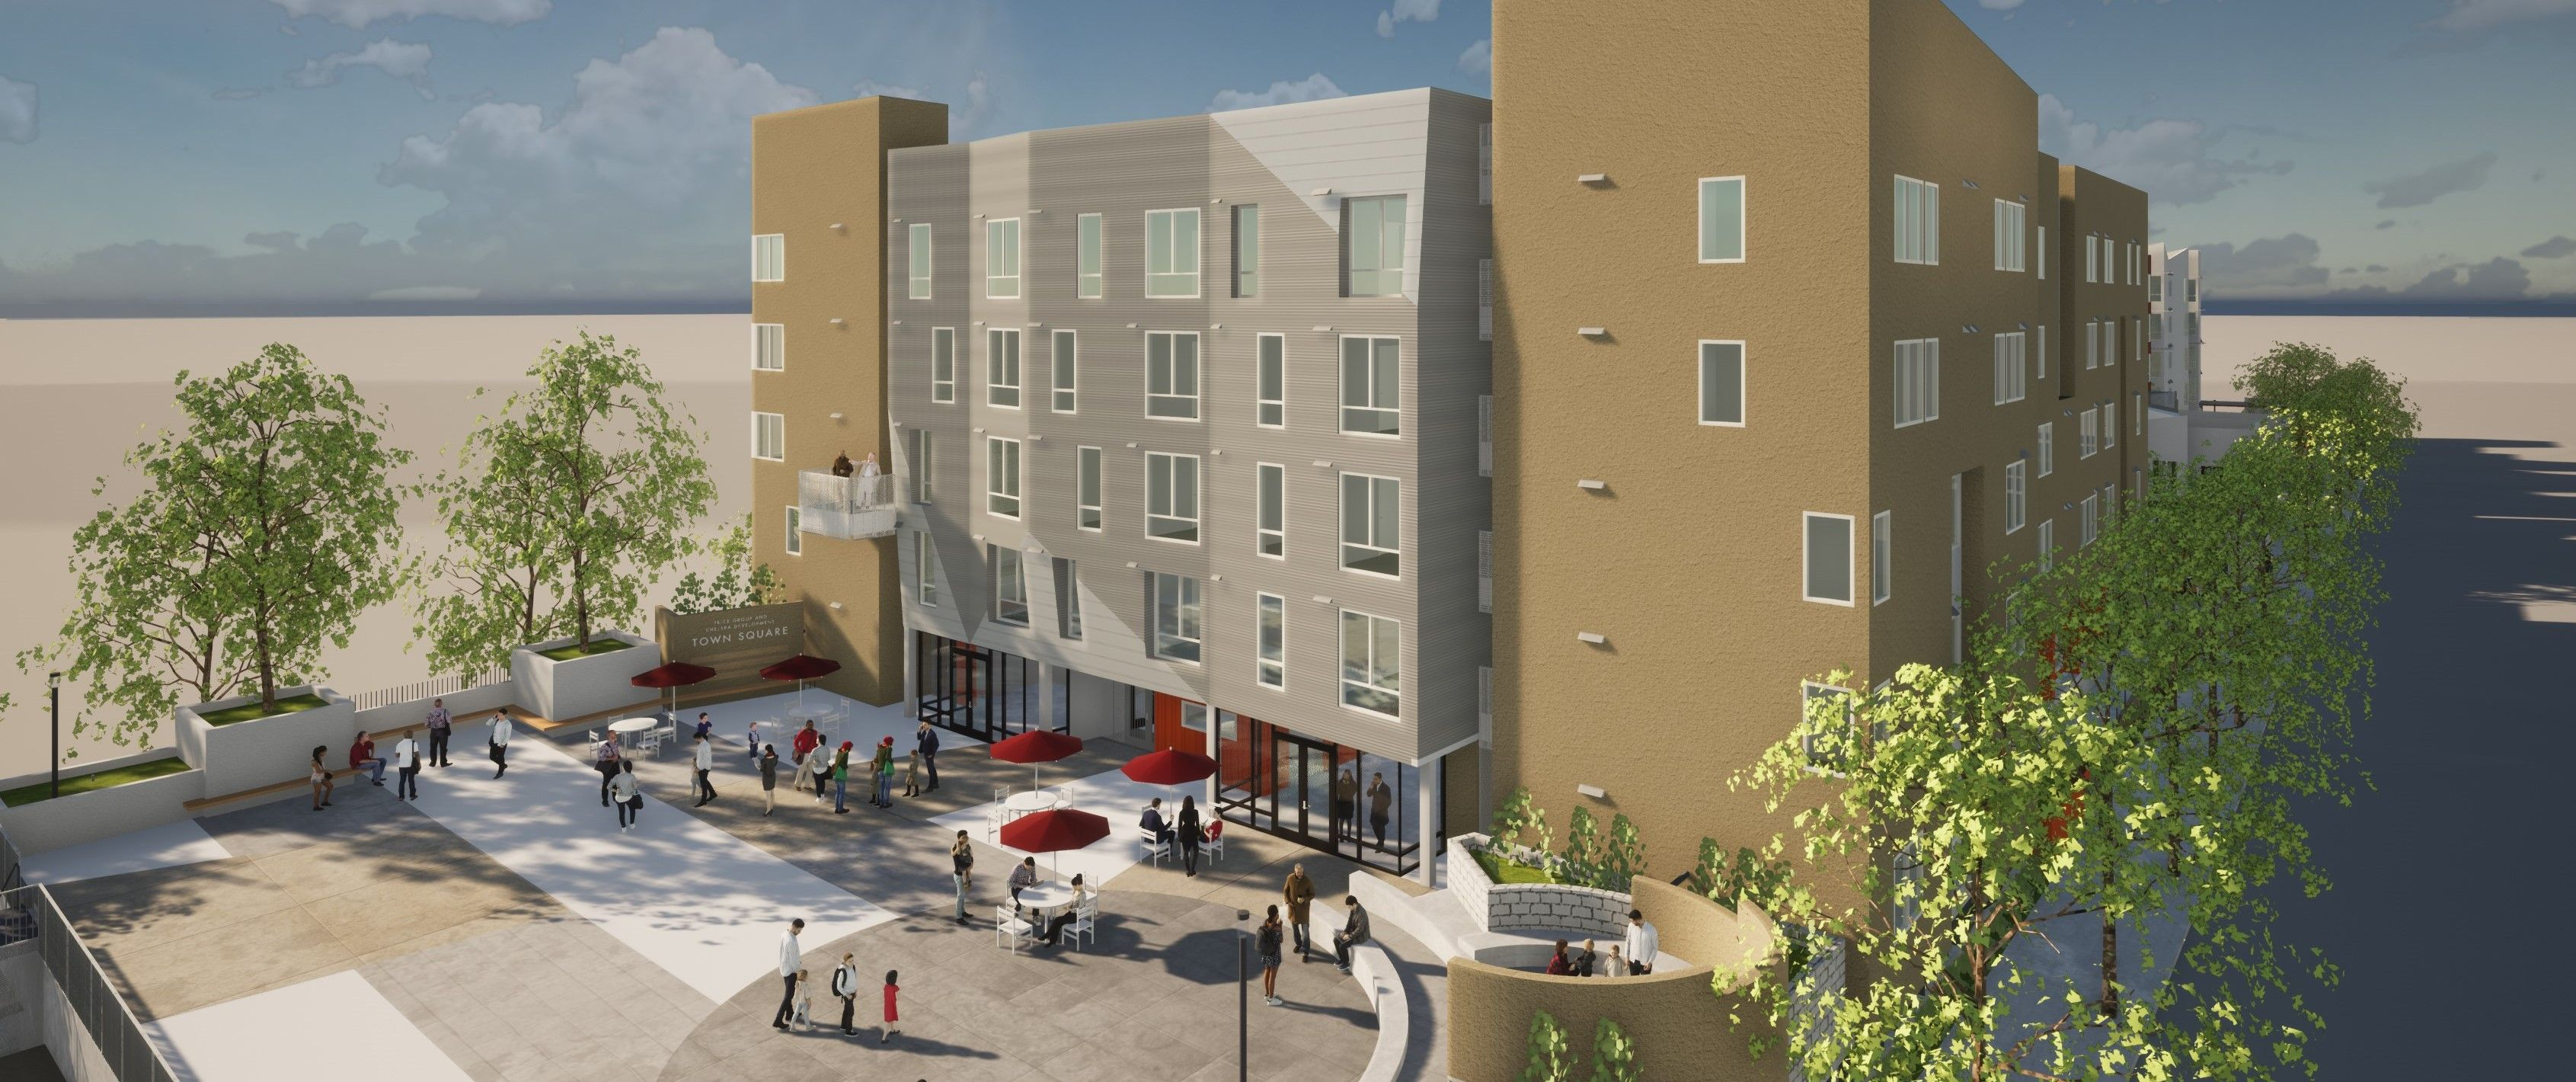 Breaking Ground on New Housing